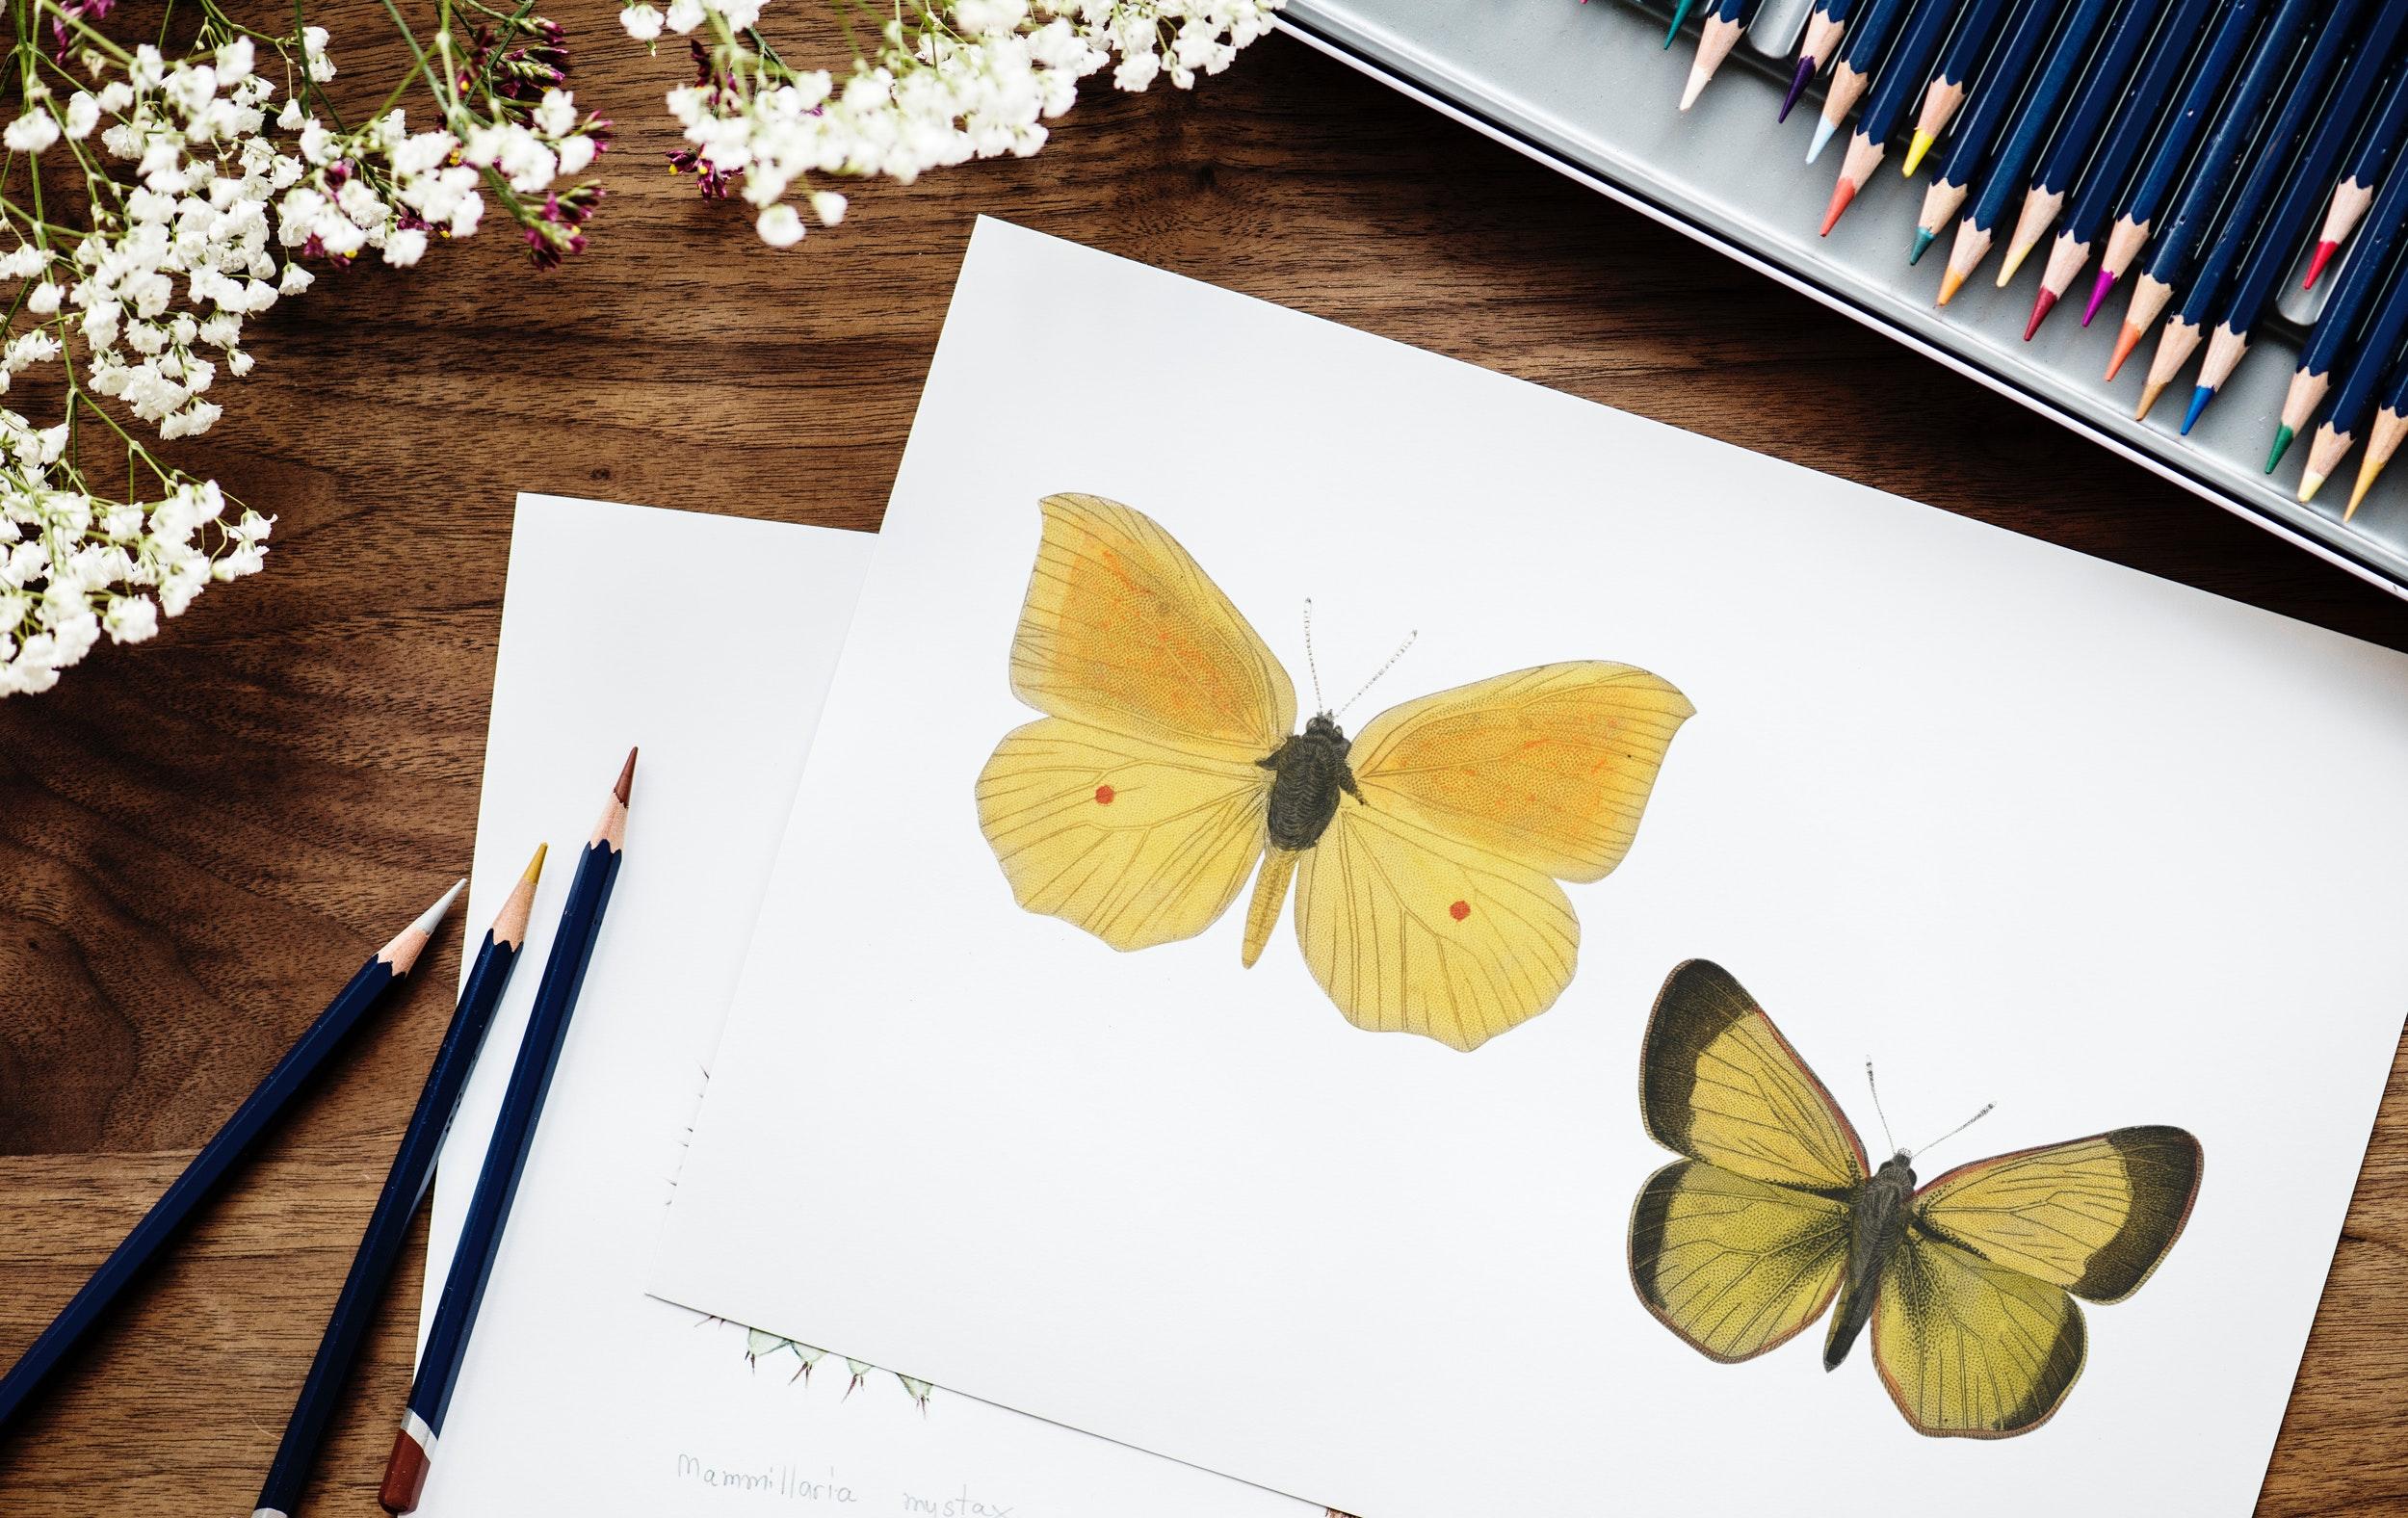 Fotos Gratis Art Mariposas Colorante Lapices De Colores